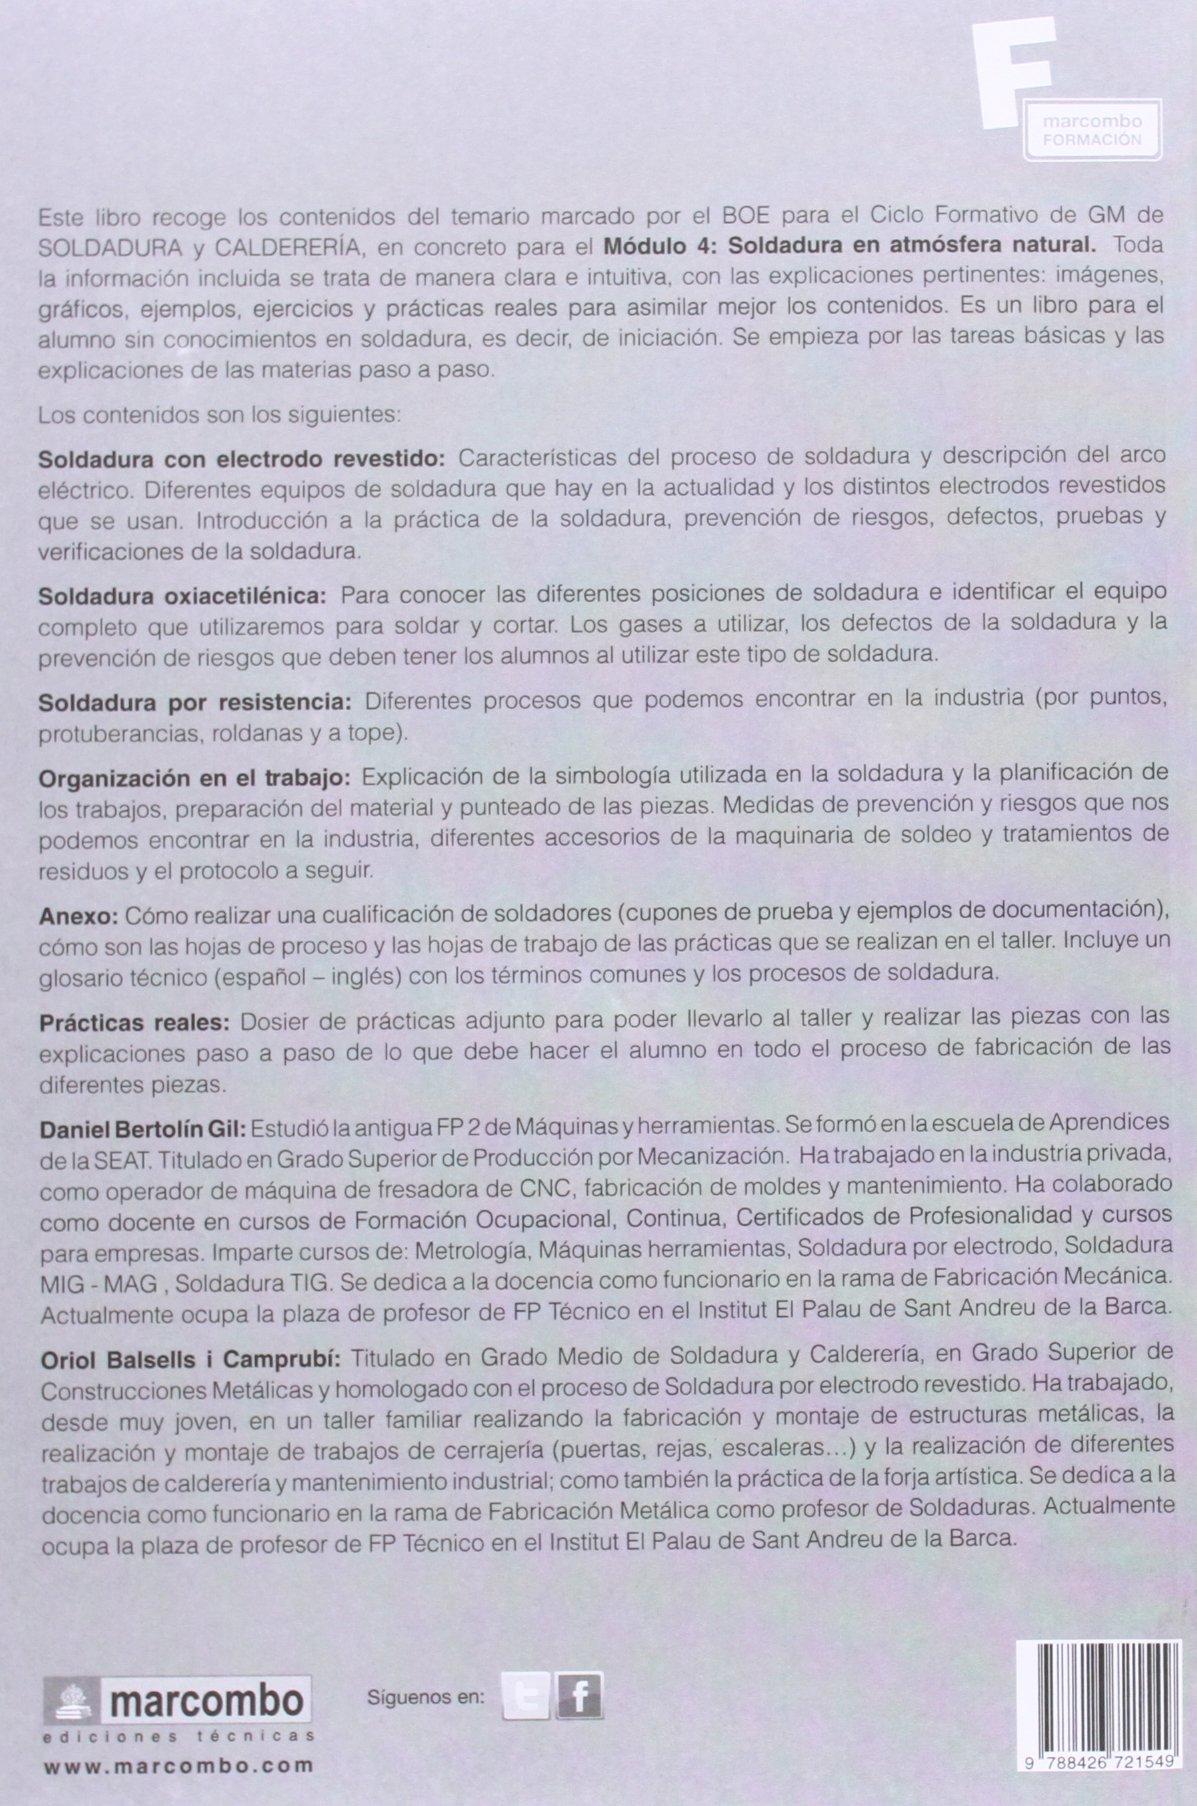 Soldadura en atmosfera natural [Aug 01, 2014] Bertiolin, Daniel and Balcells, Oriol: Daniel Bertolin Gil Oriol Balsells i Camprubi: 9788426721549: ...